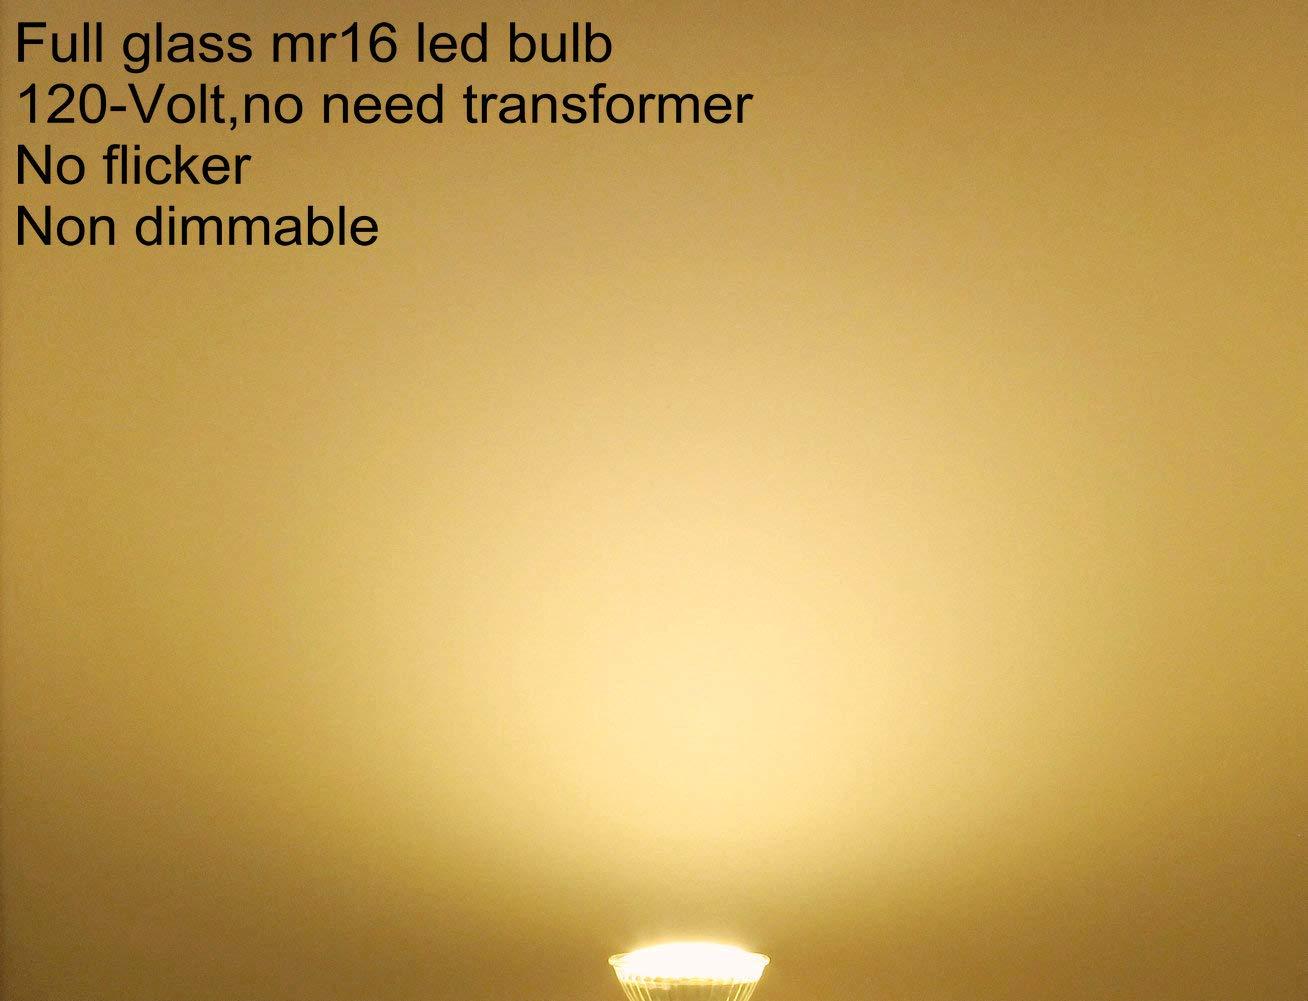 Full Glass 120V MR16 LED Warm White 4W Spotlight Bulb GU5.3 LED Flood Light 2700K Soft White CRI80,130-Degree Wide Beam Angle 35W-50W Halogen Equivalent